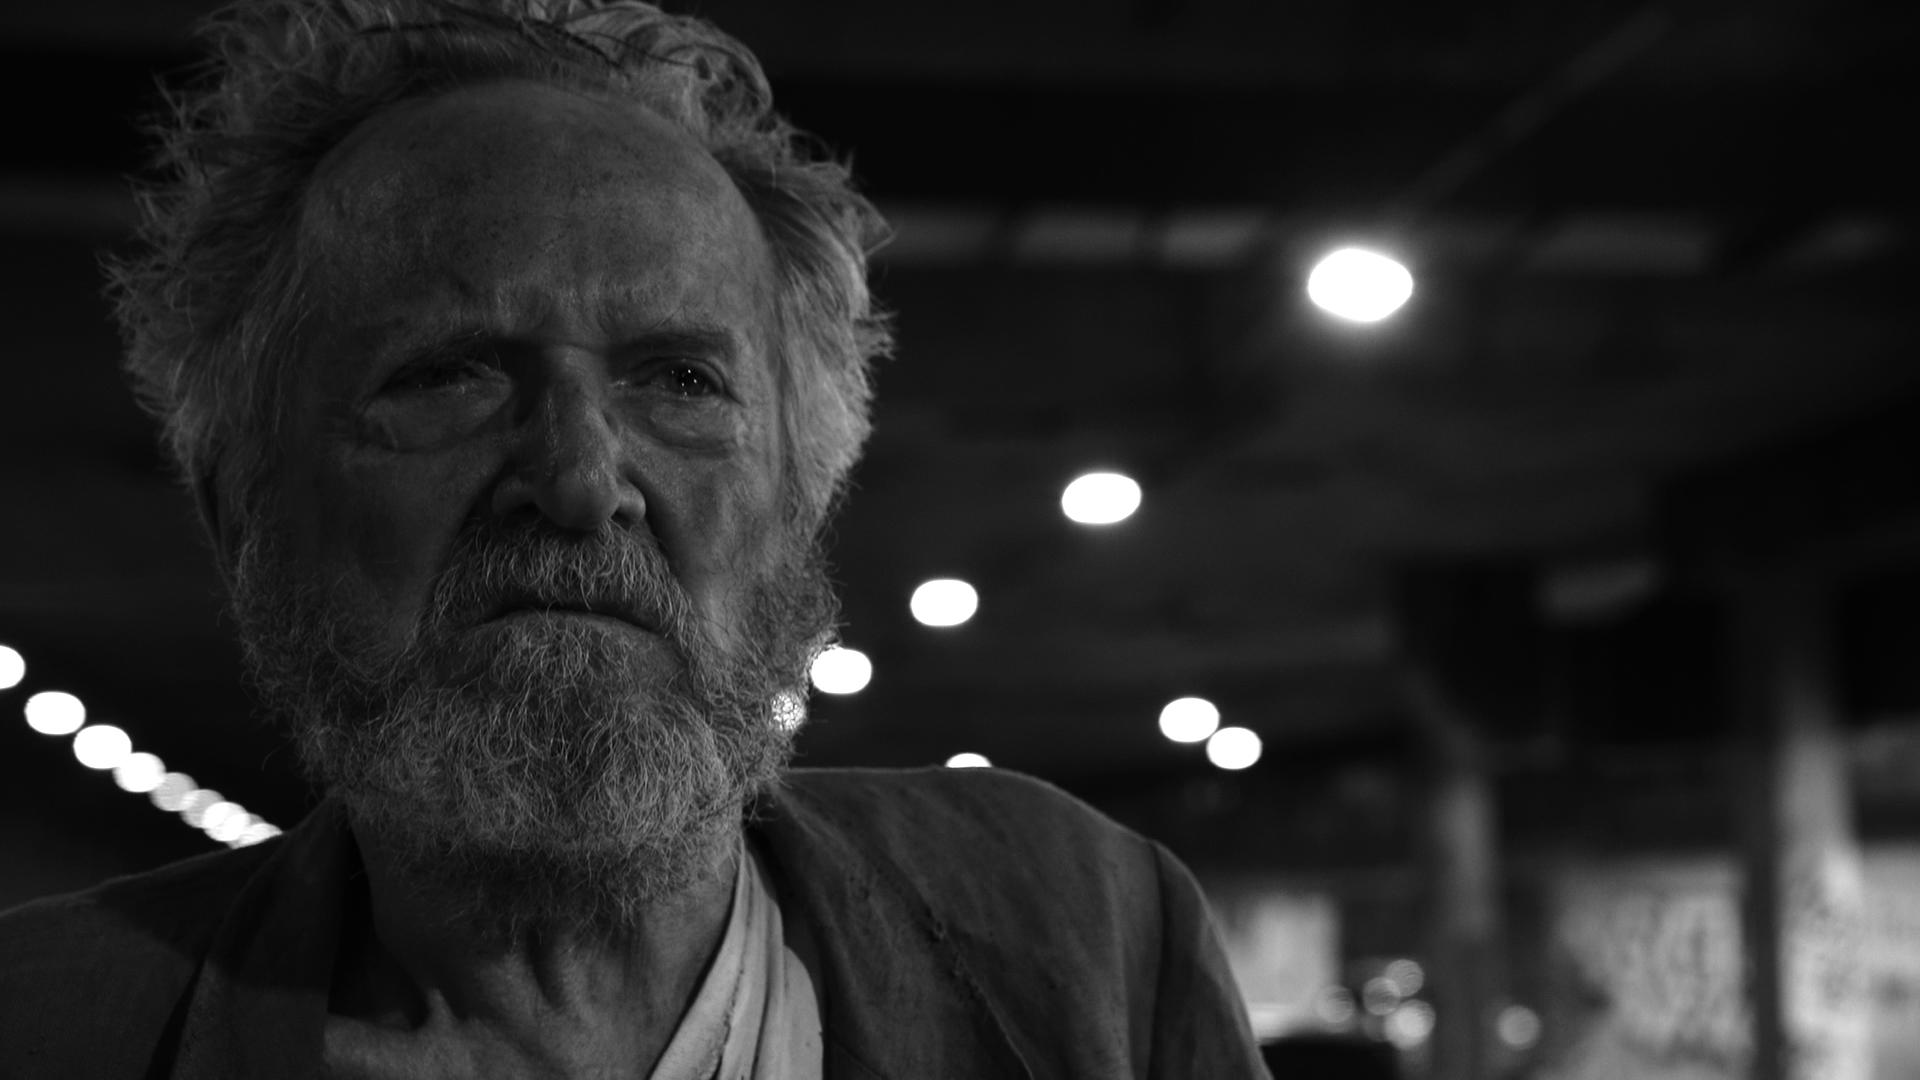 Filme Fome, de Cristiano Burlan, estreia nas telas brasileiras